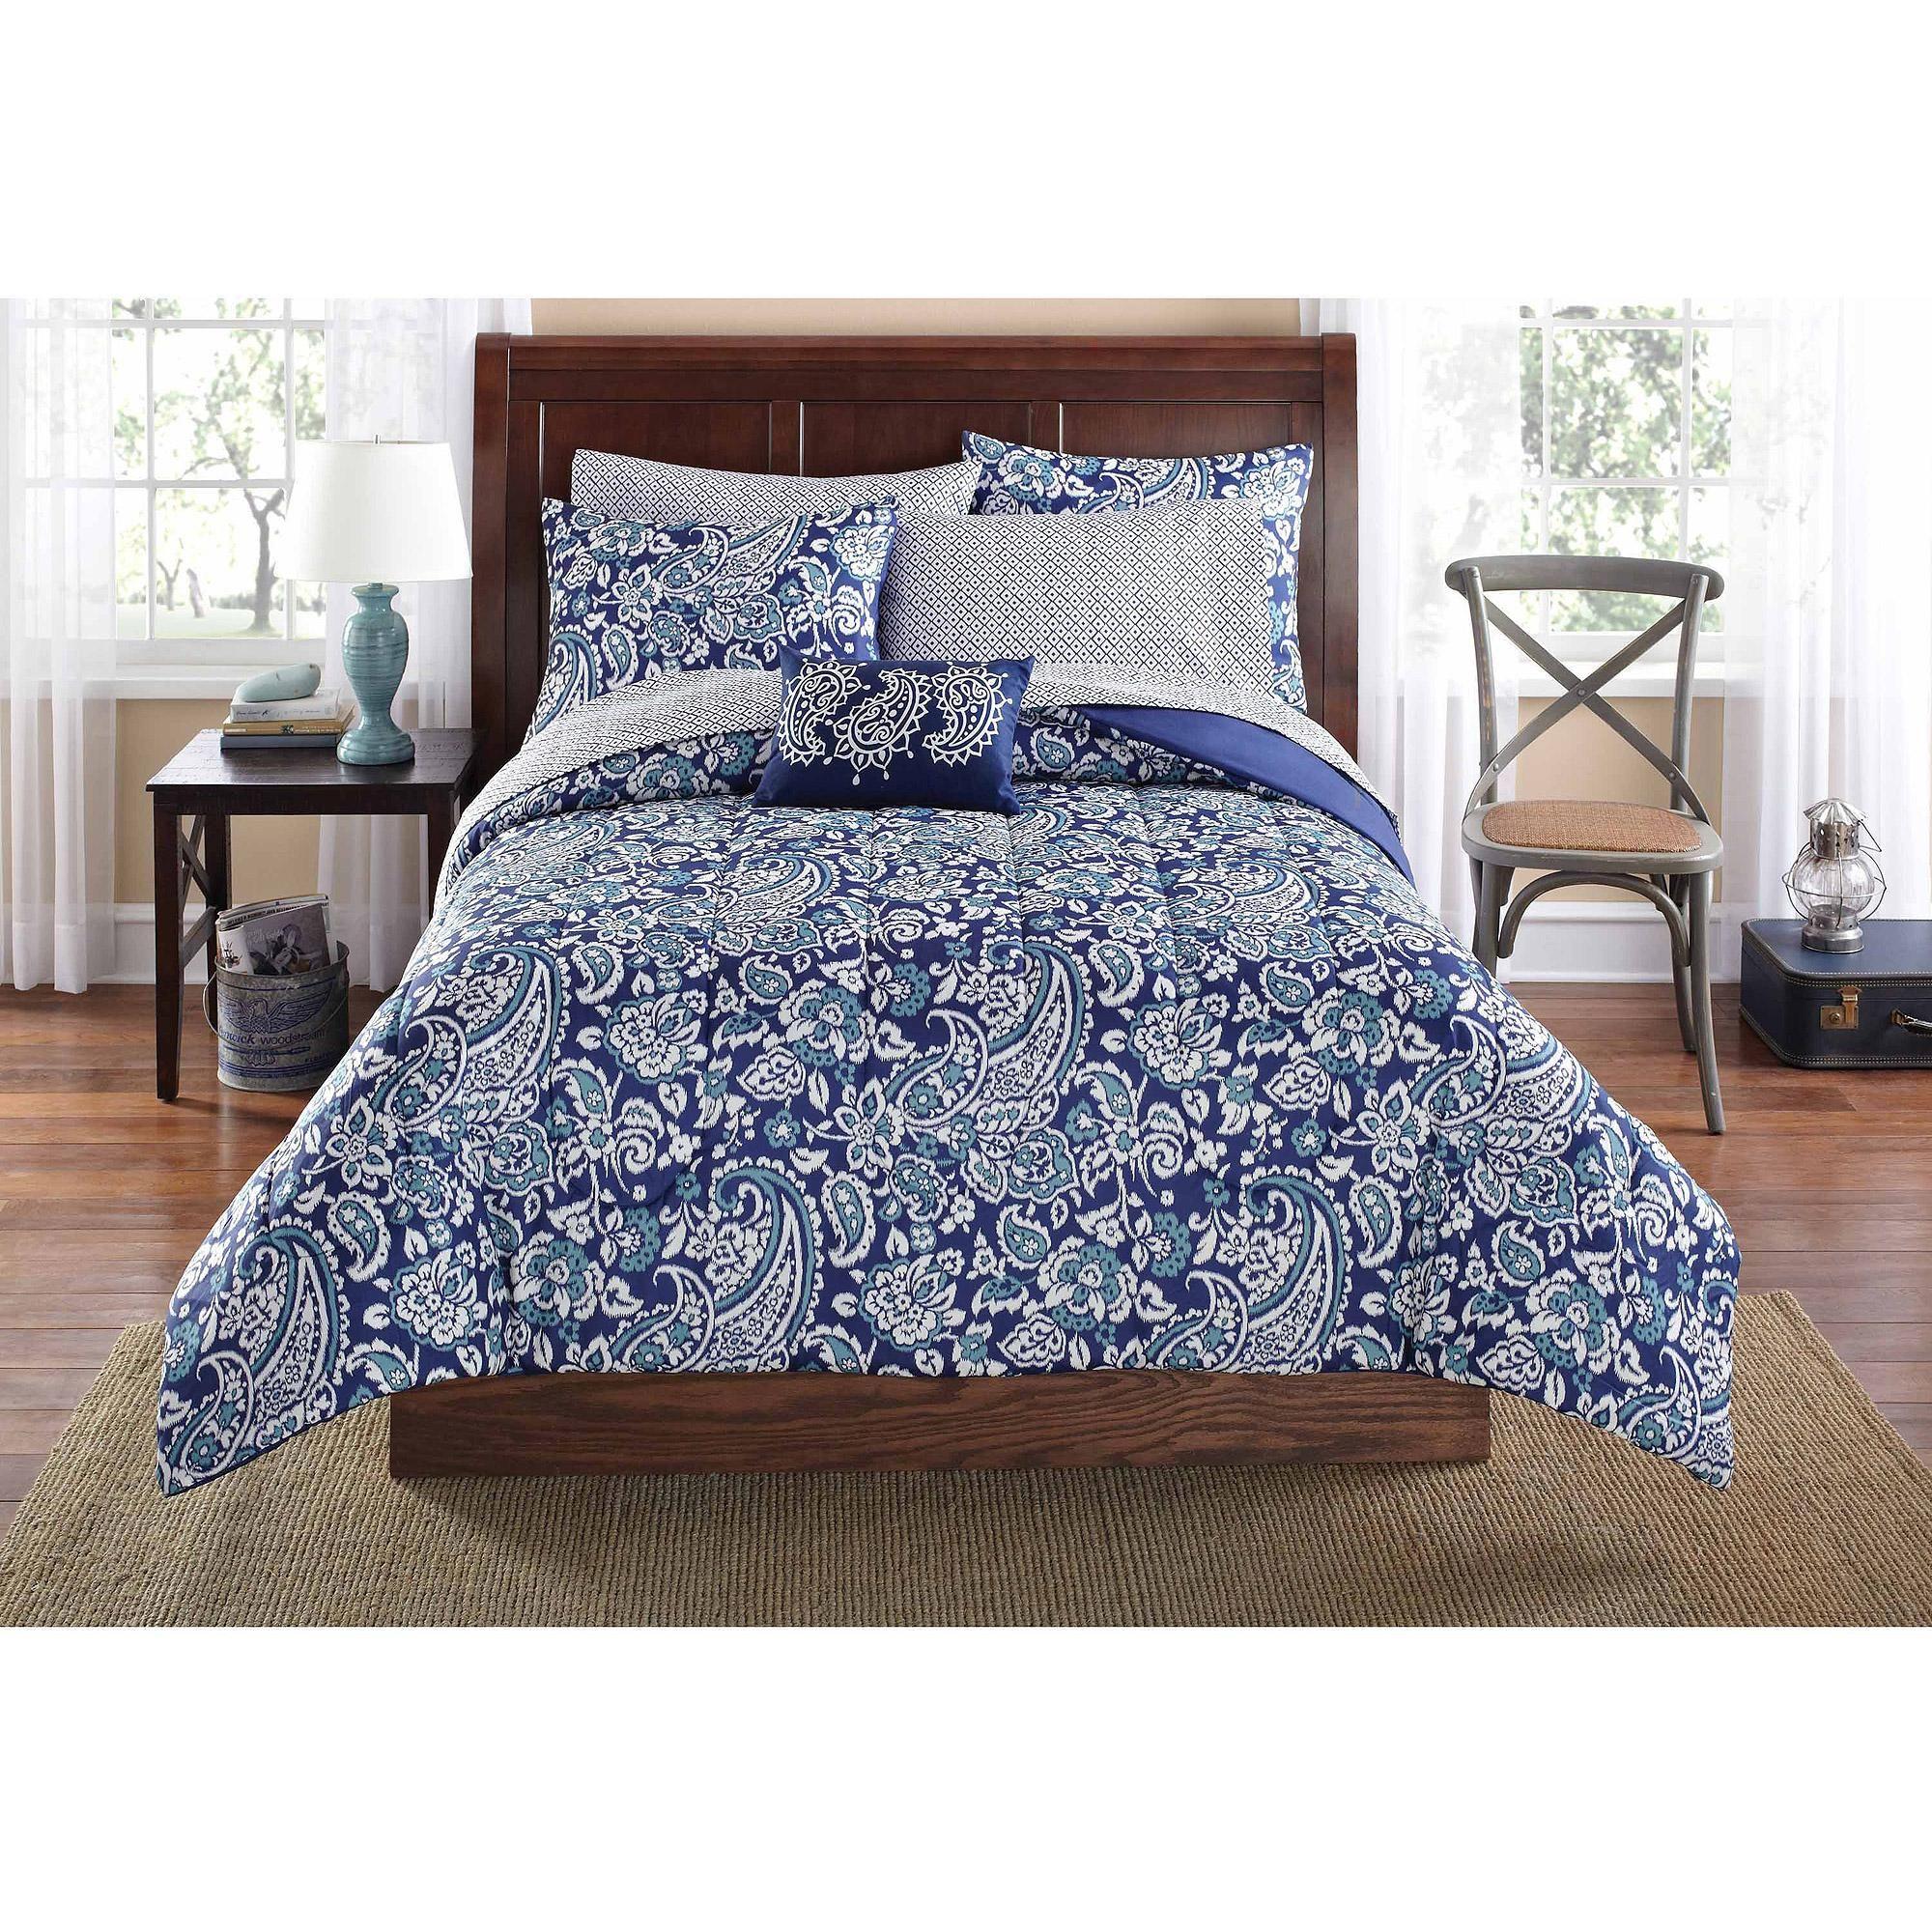 77fda4fa1954e7a330151b31d8359d2a - Better Homes And Gardens Indigo Paisley Comforter Set